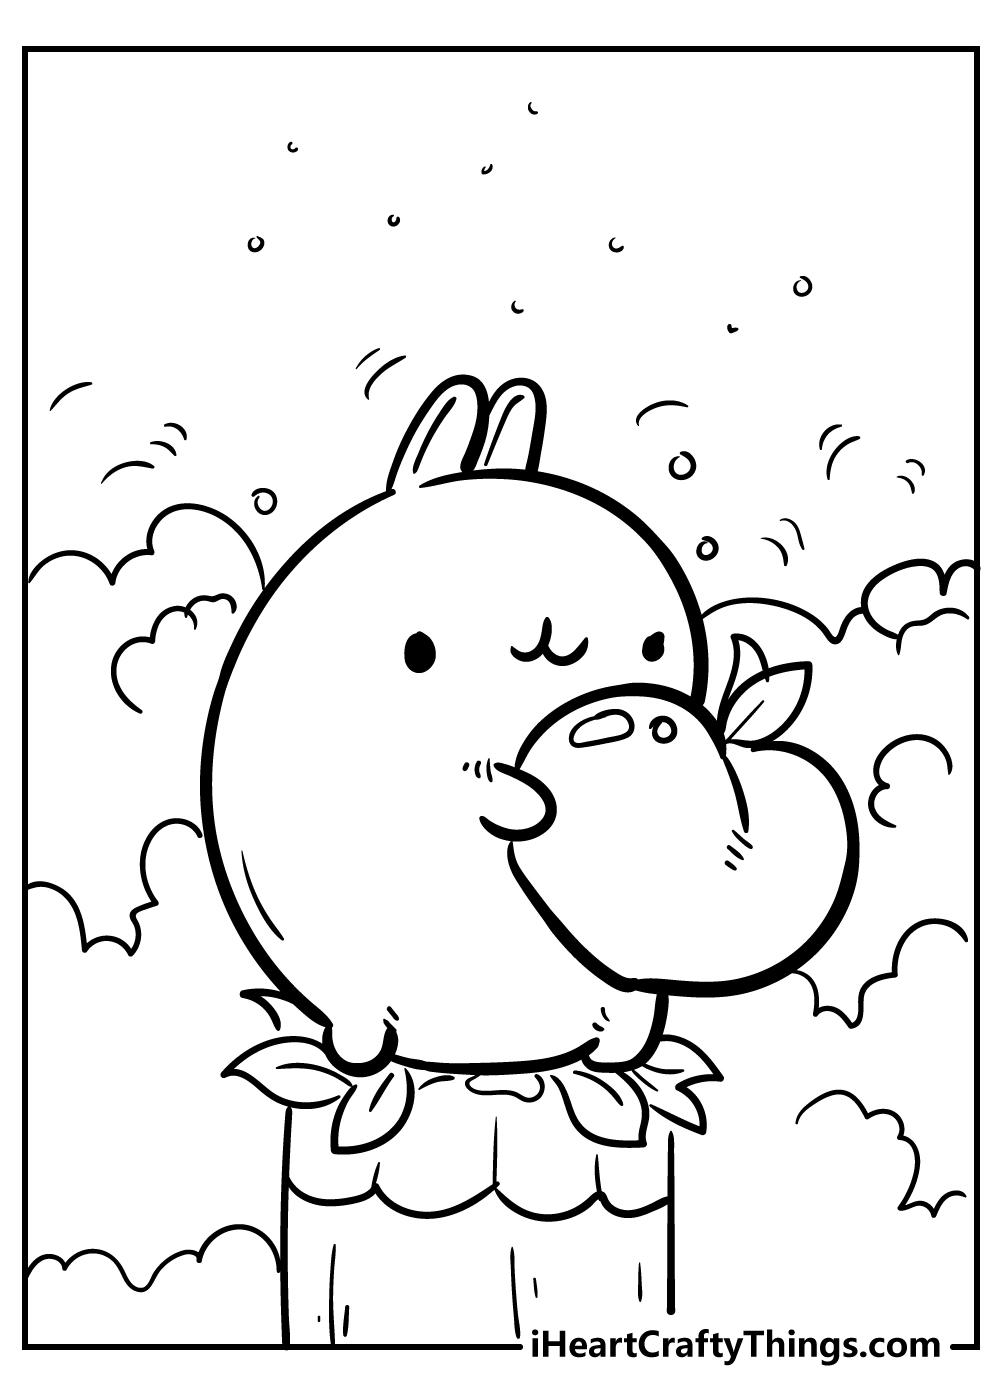 kawaii coloring pages of bunnies